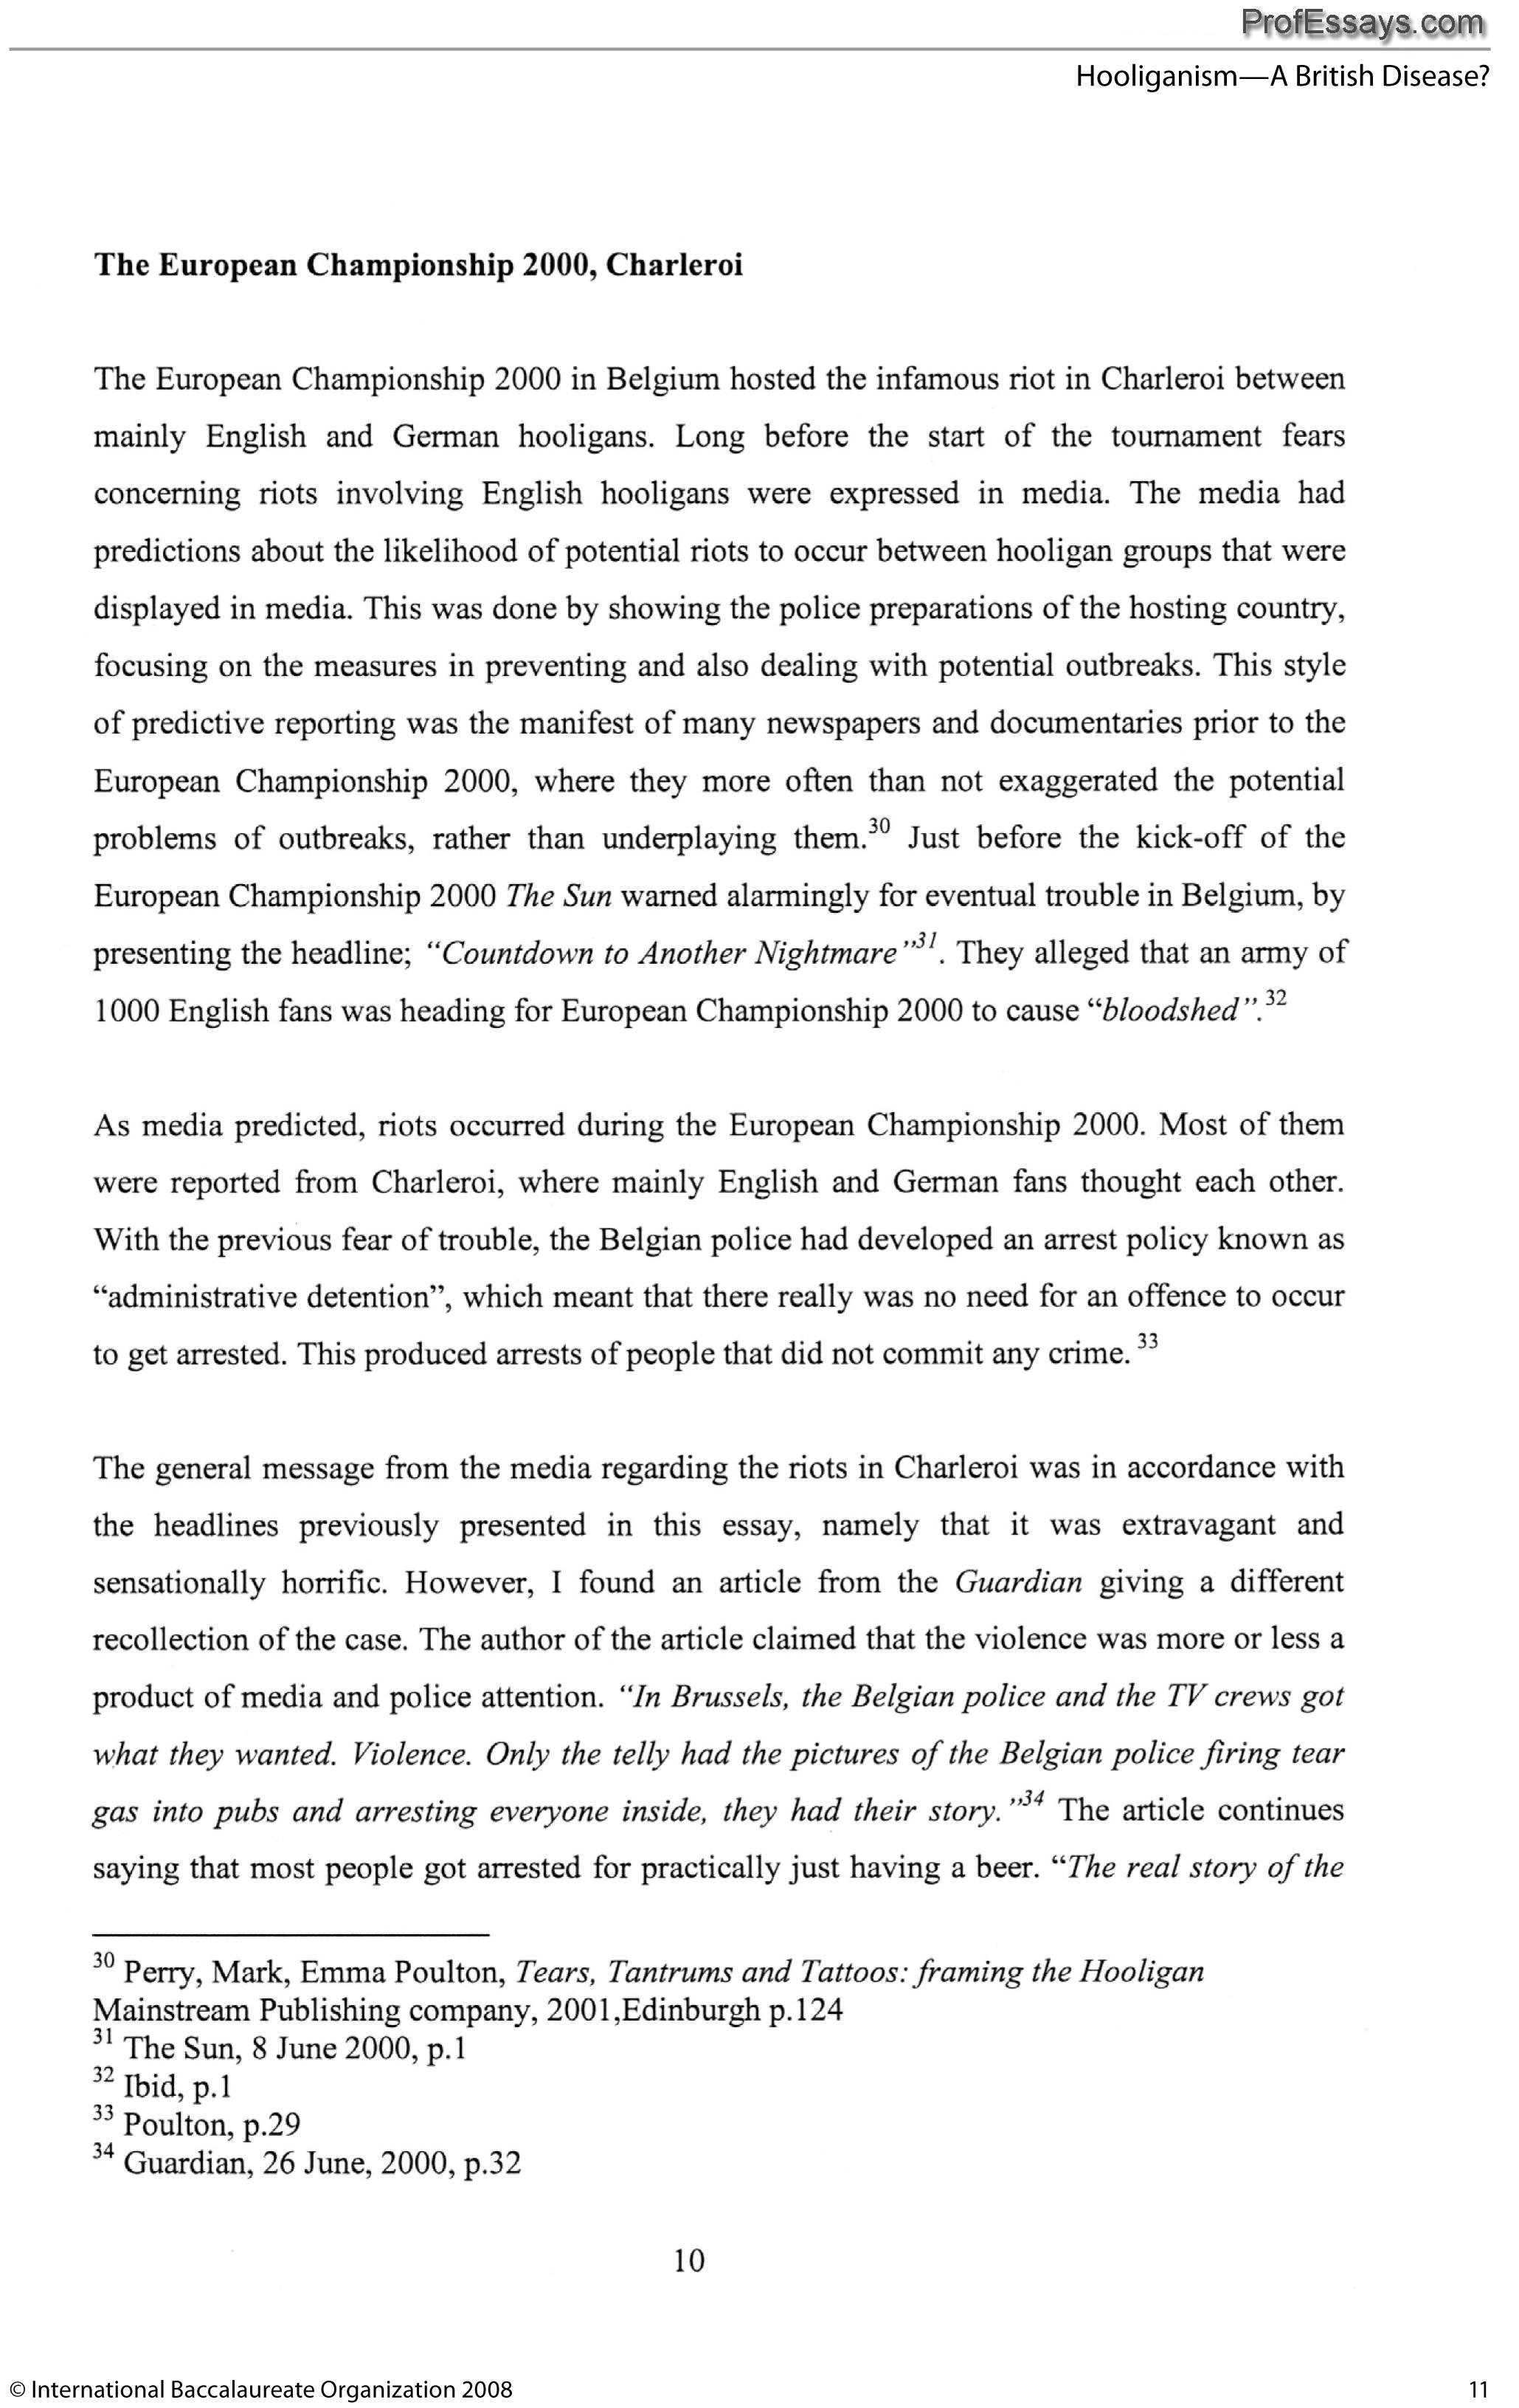 017 English Essays Essay Example Ib Extended Free Rare 101 Reading And Writing Topics Full